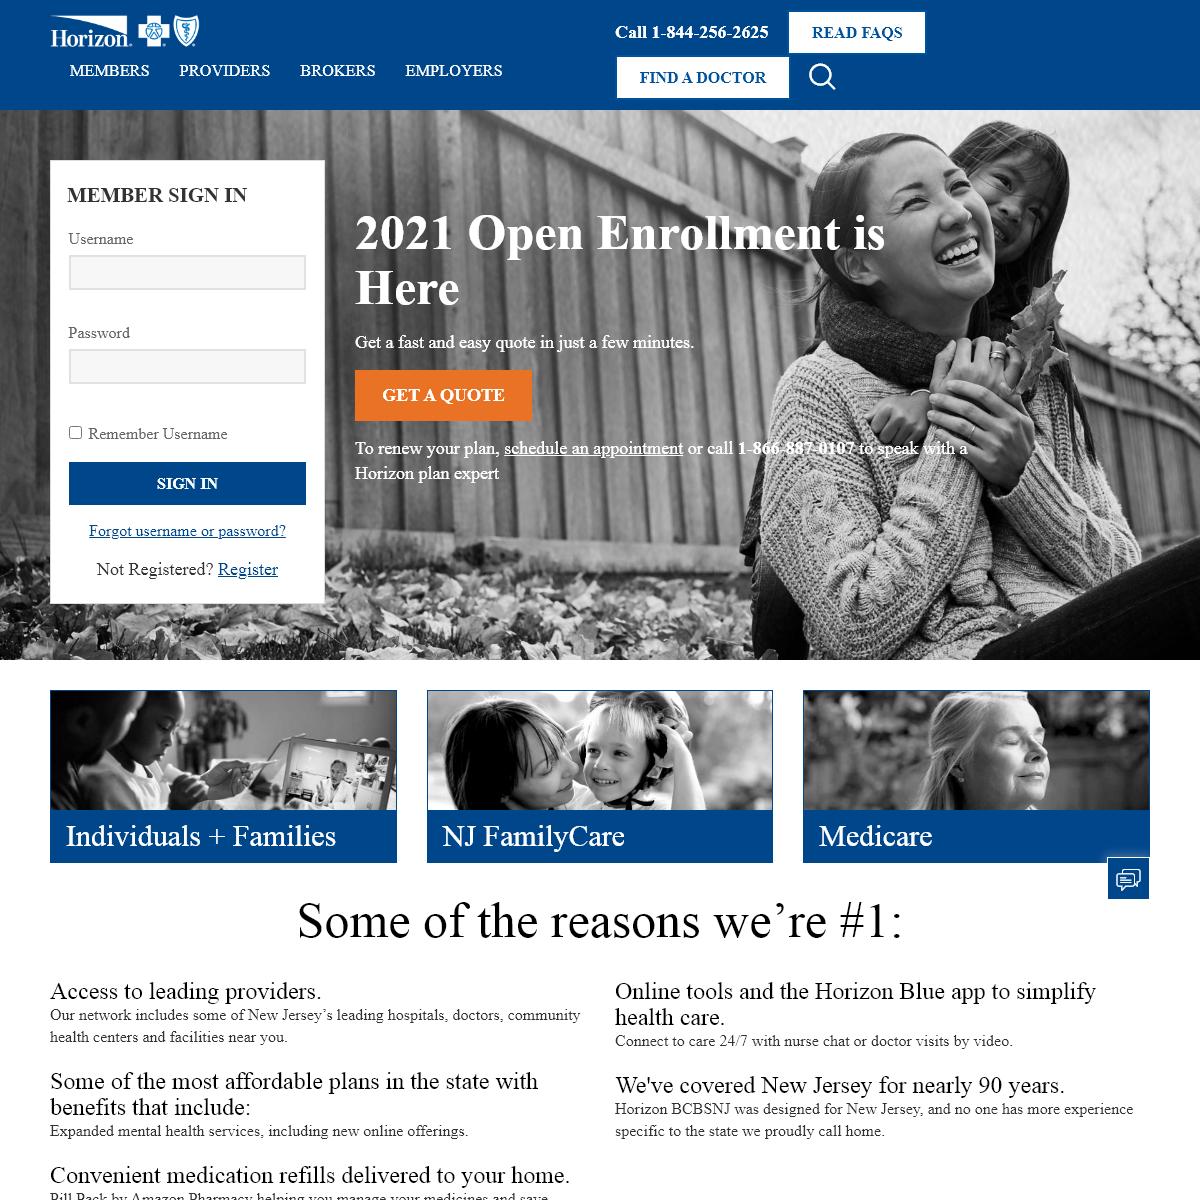 Horizon Blue Cross Blue Shield of New Jersey (Horizon BCBSNJ) - NJ Health Insurance & Healthcare Provider